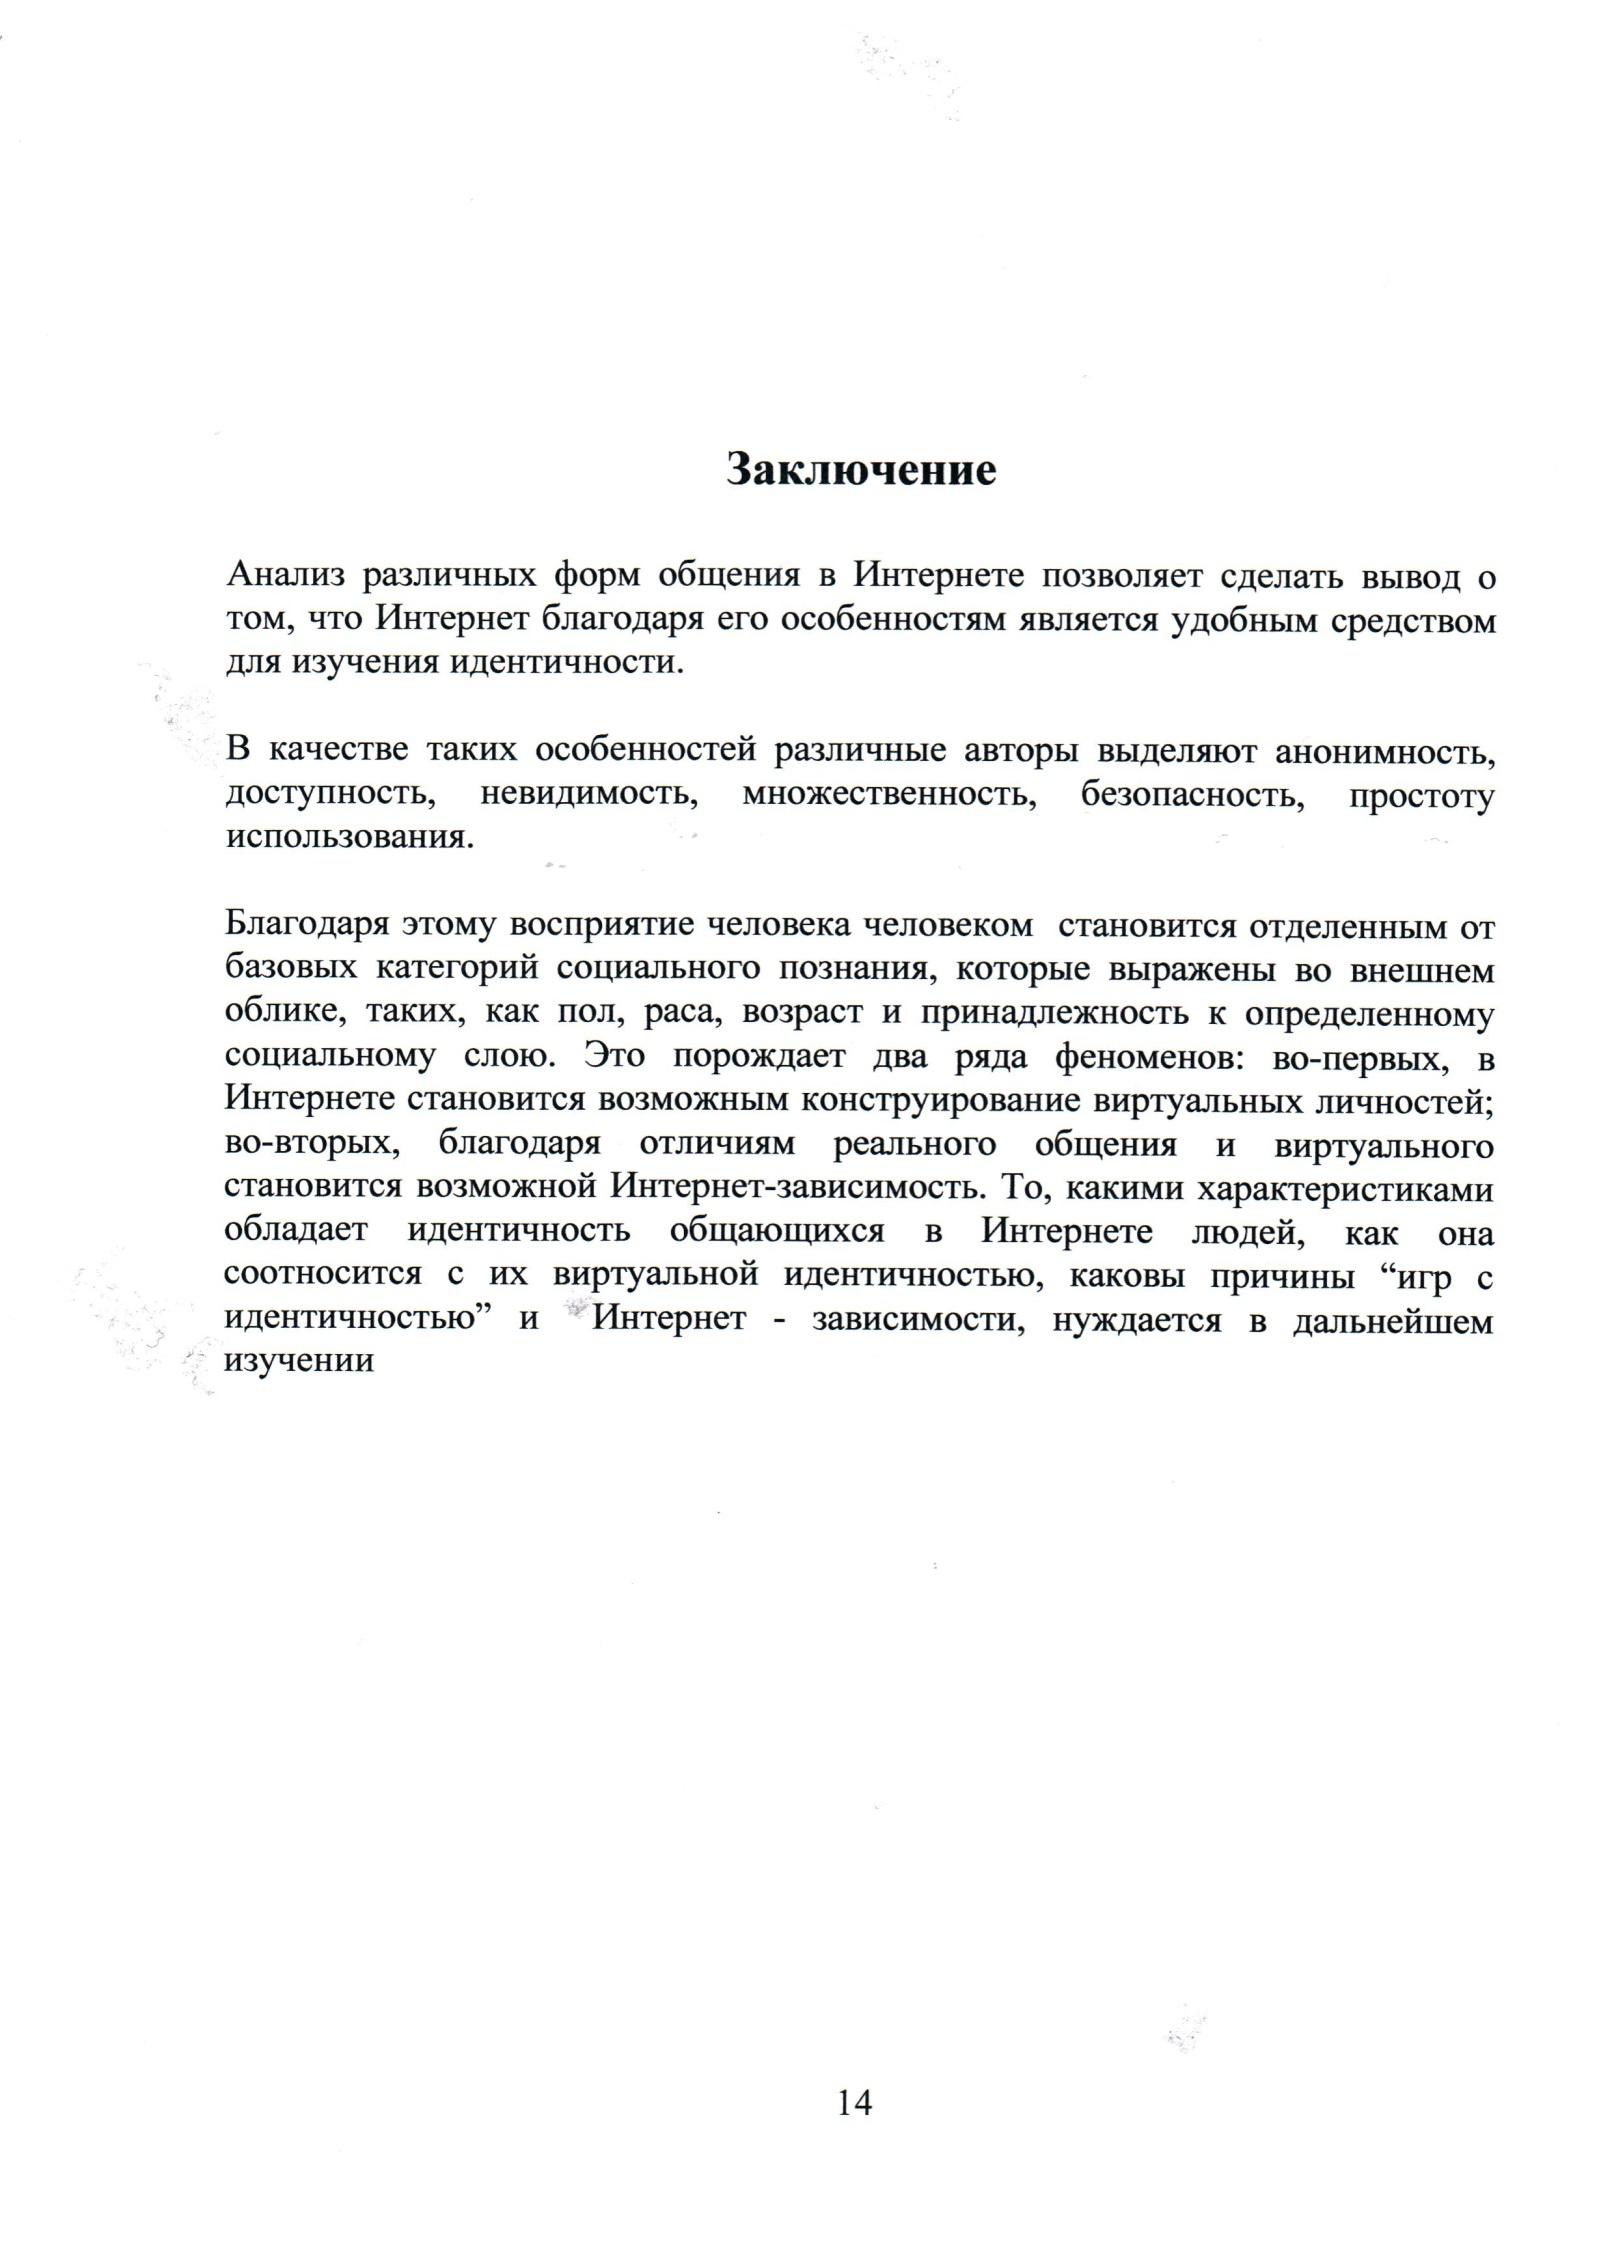 C:\Users\Ирина\Documents\Panasonic\MFS\Scan\20160225_105411.jpg